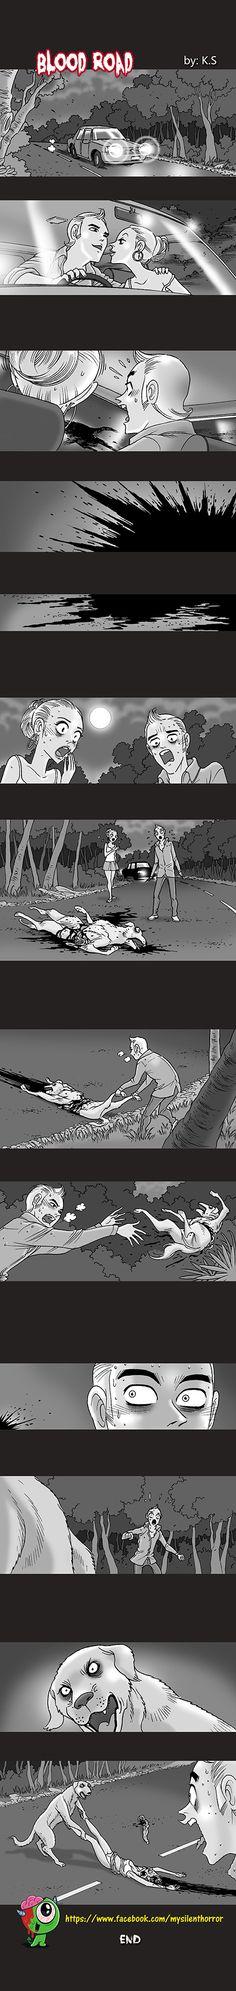 Silent Horror :: Blood Road | Tapastic Comics - image 1